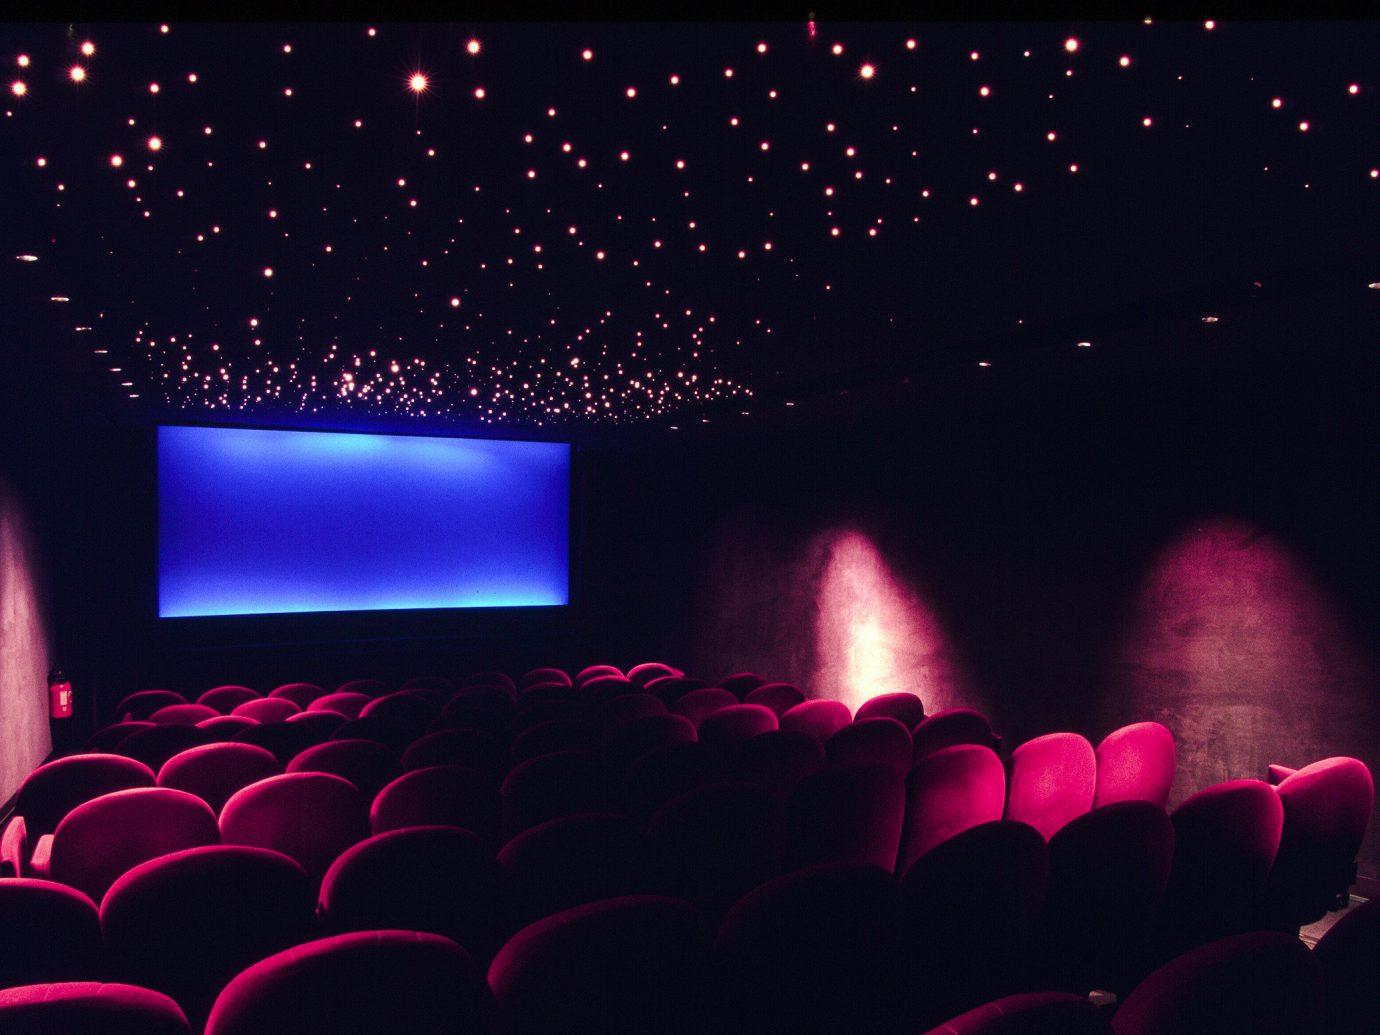 Romance Trip Ideas light Entertainment theatre laptop stage lighting auditorium darkness movie theater magenta sky computer wallpaper night event